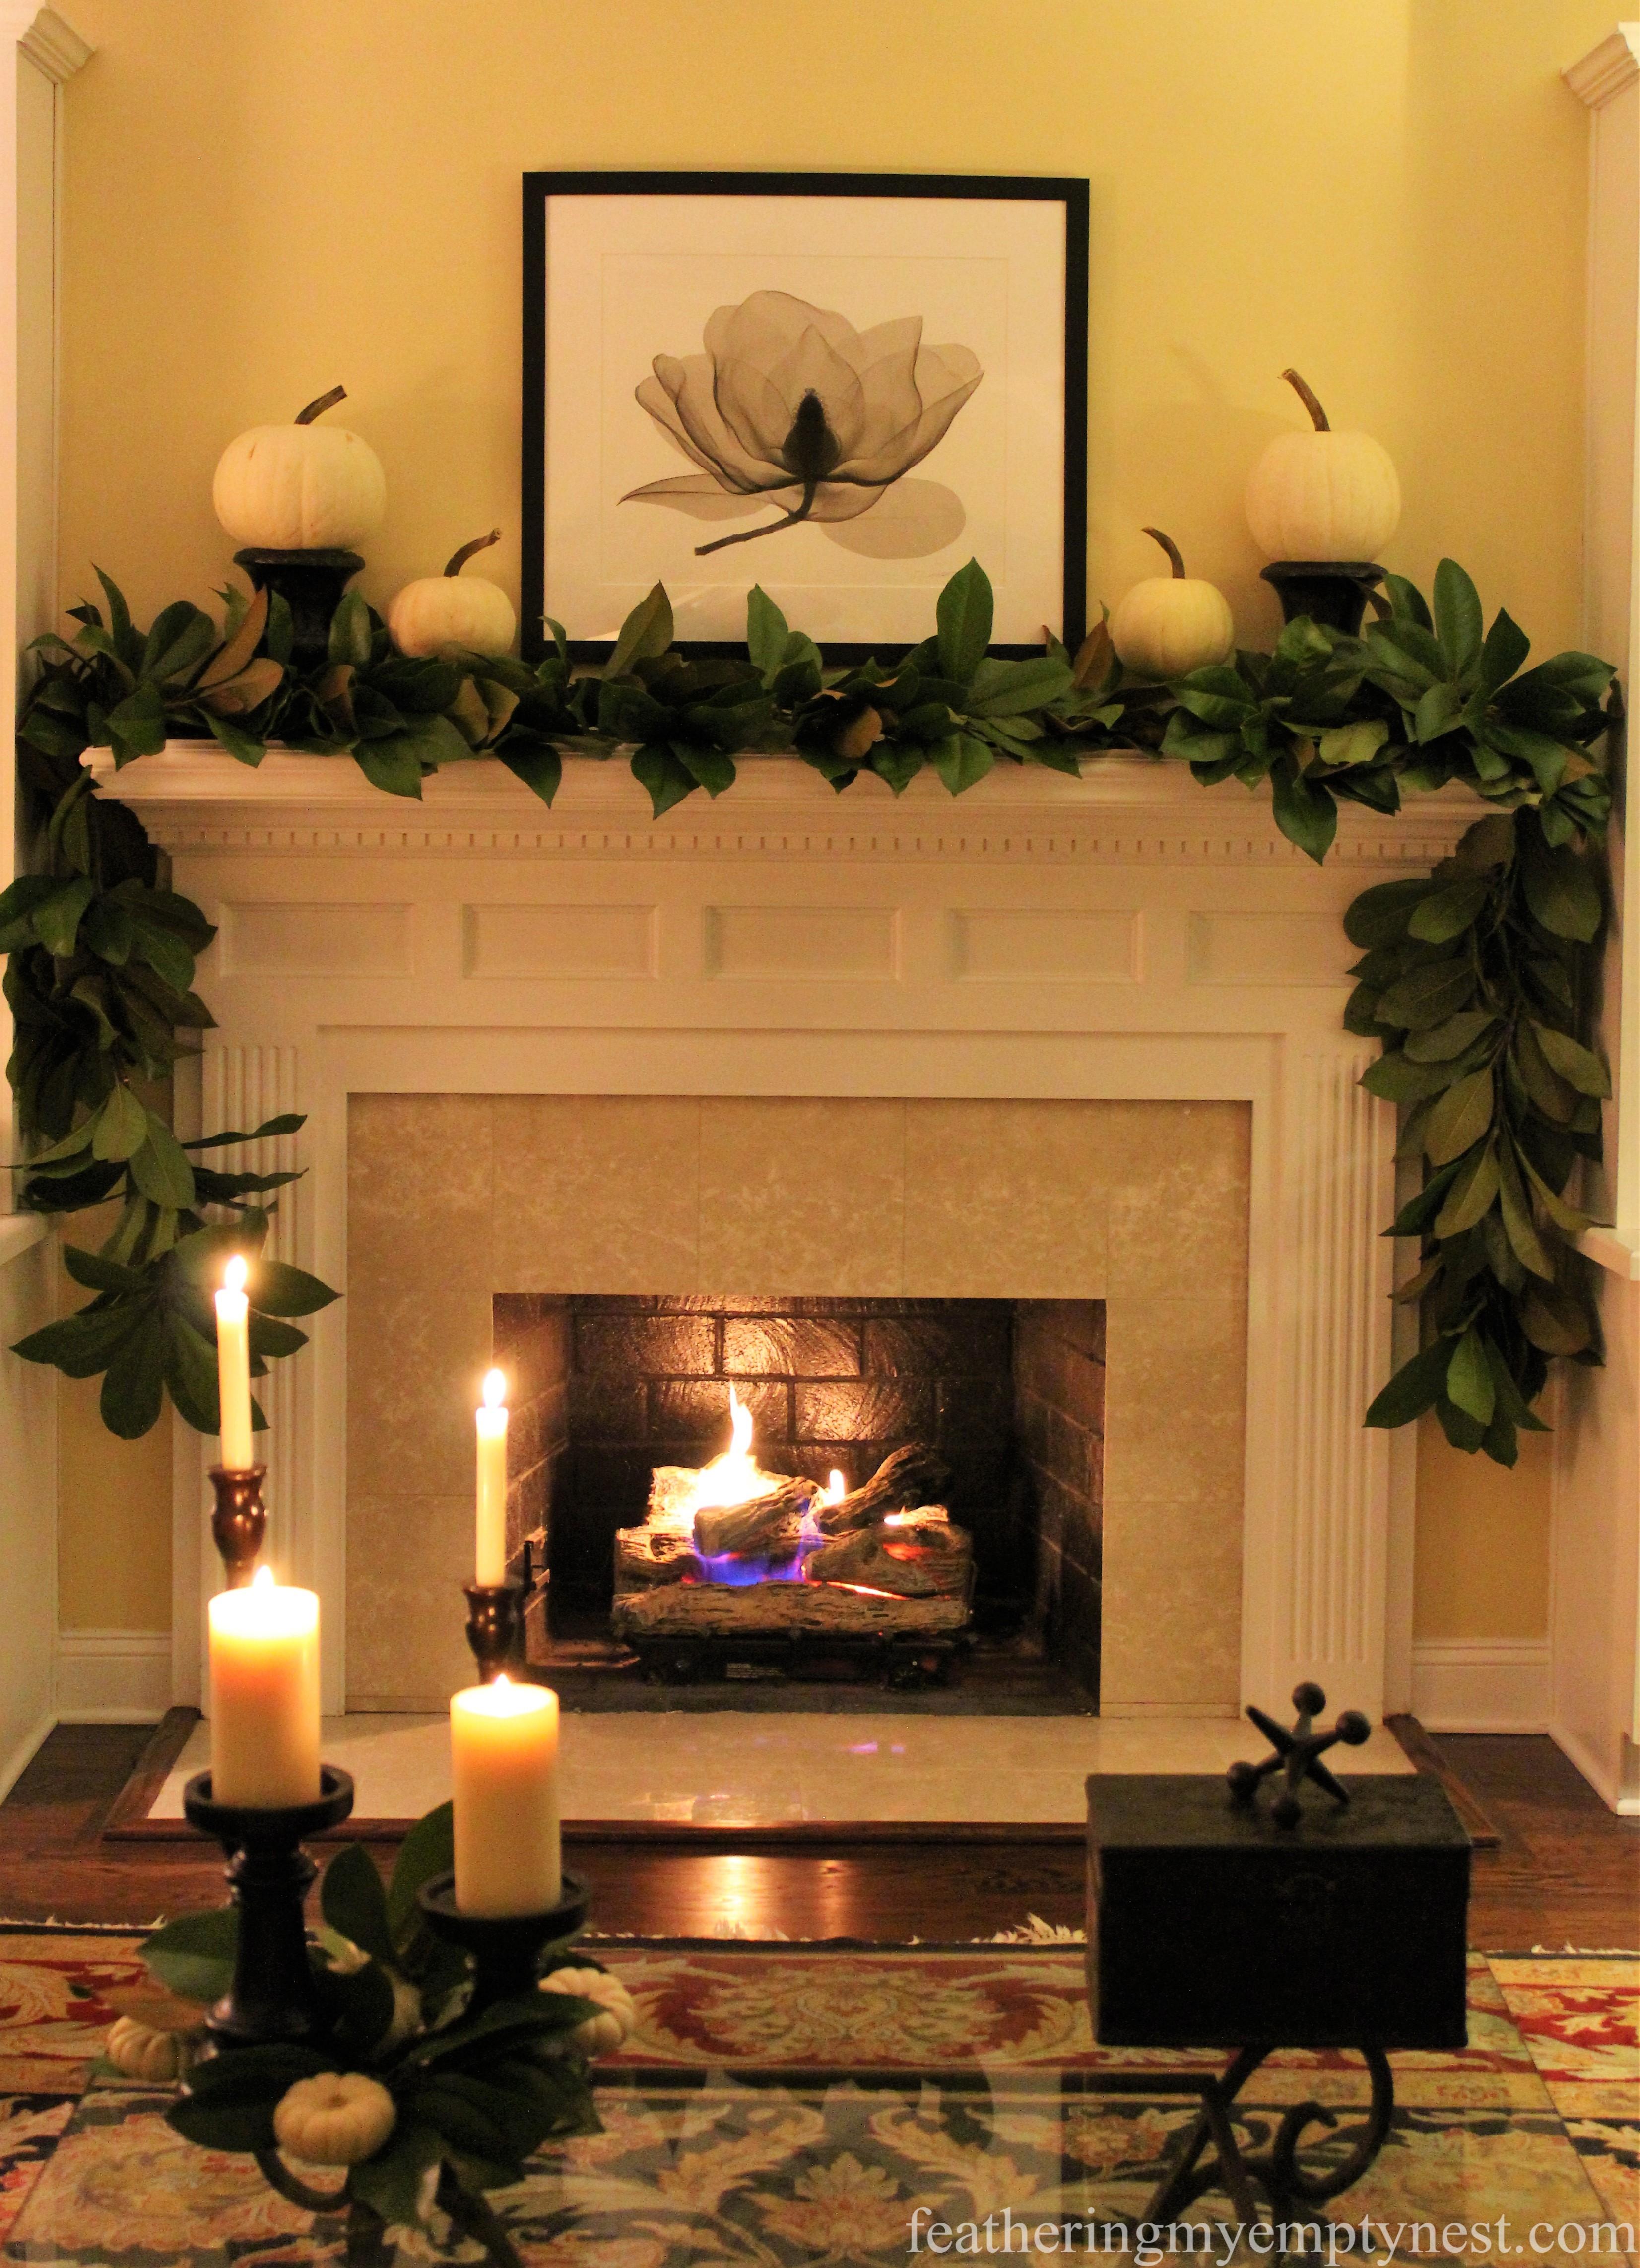 DIY Thanksgiving fresh magnolia garland was re-purposed for Christmas by adding plaid ribbon and ornaments --Mad For Plaid Christmas Mantel